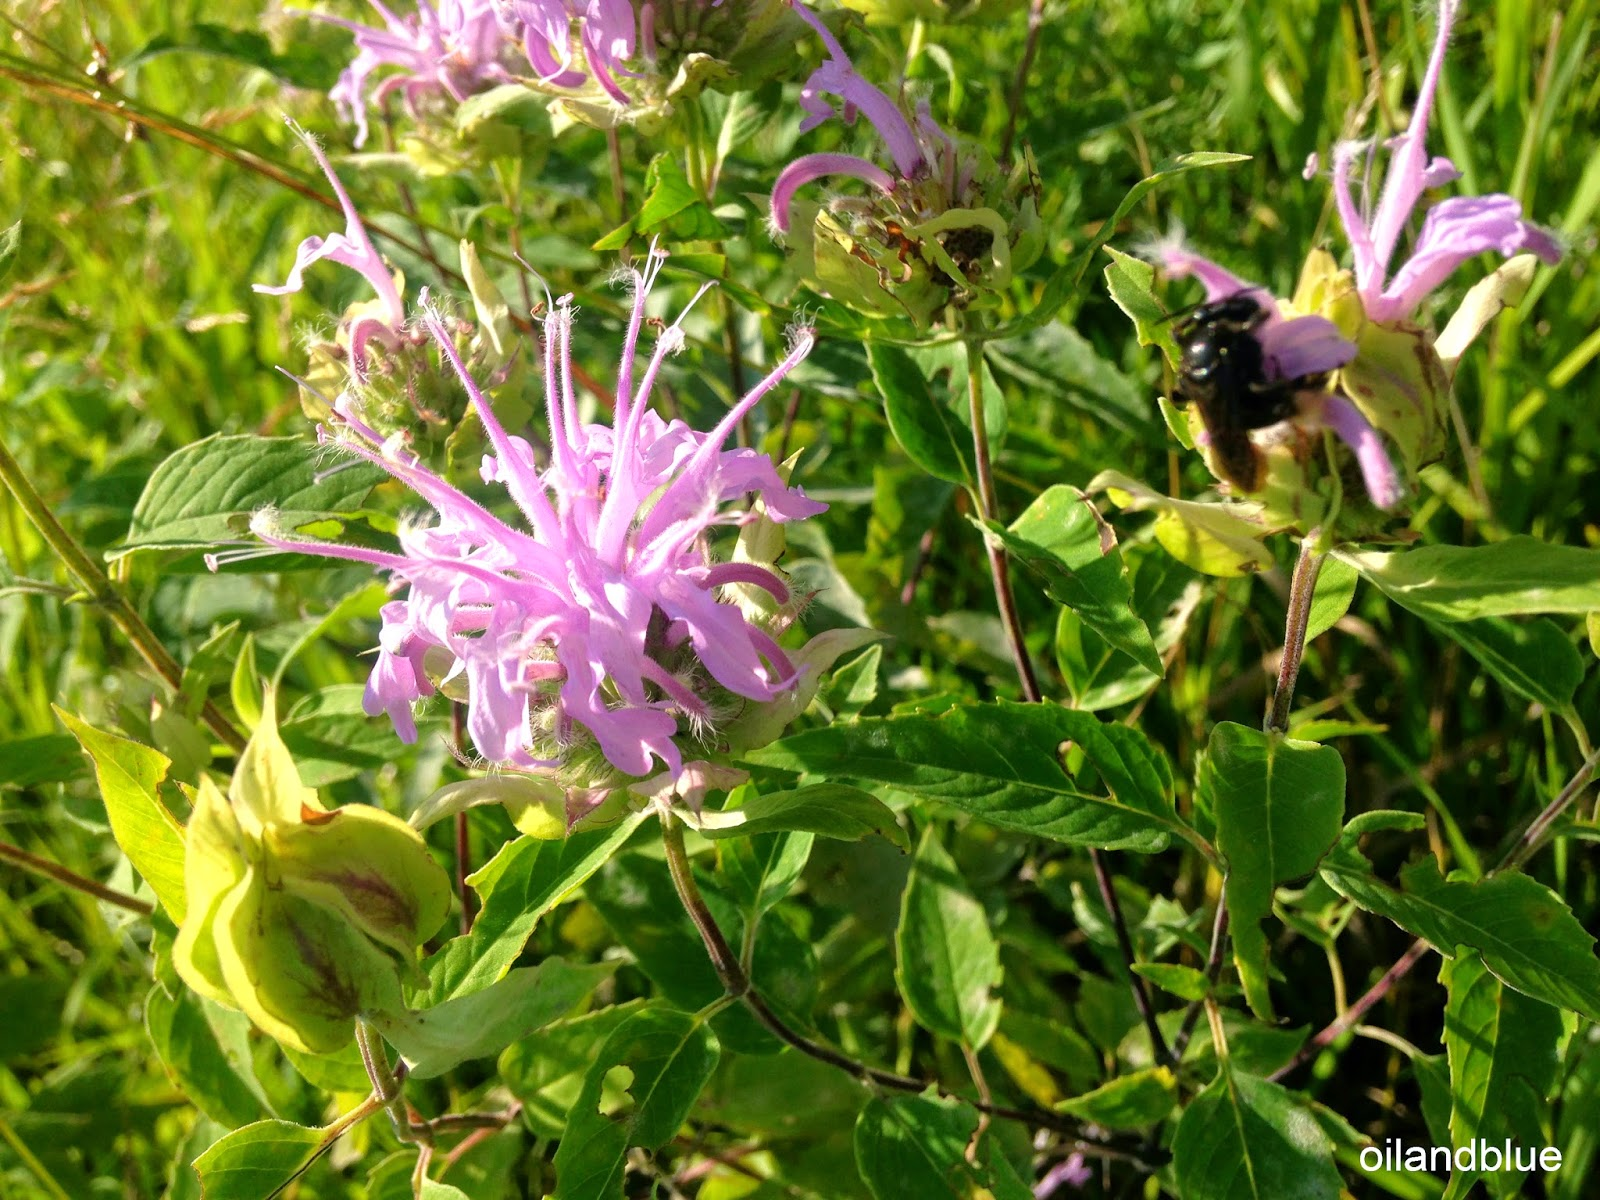 http://oilandblue.blogspot.com/2014/07/wild-harvesting-bee-balm-wild-bergamot.html